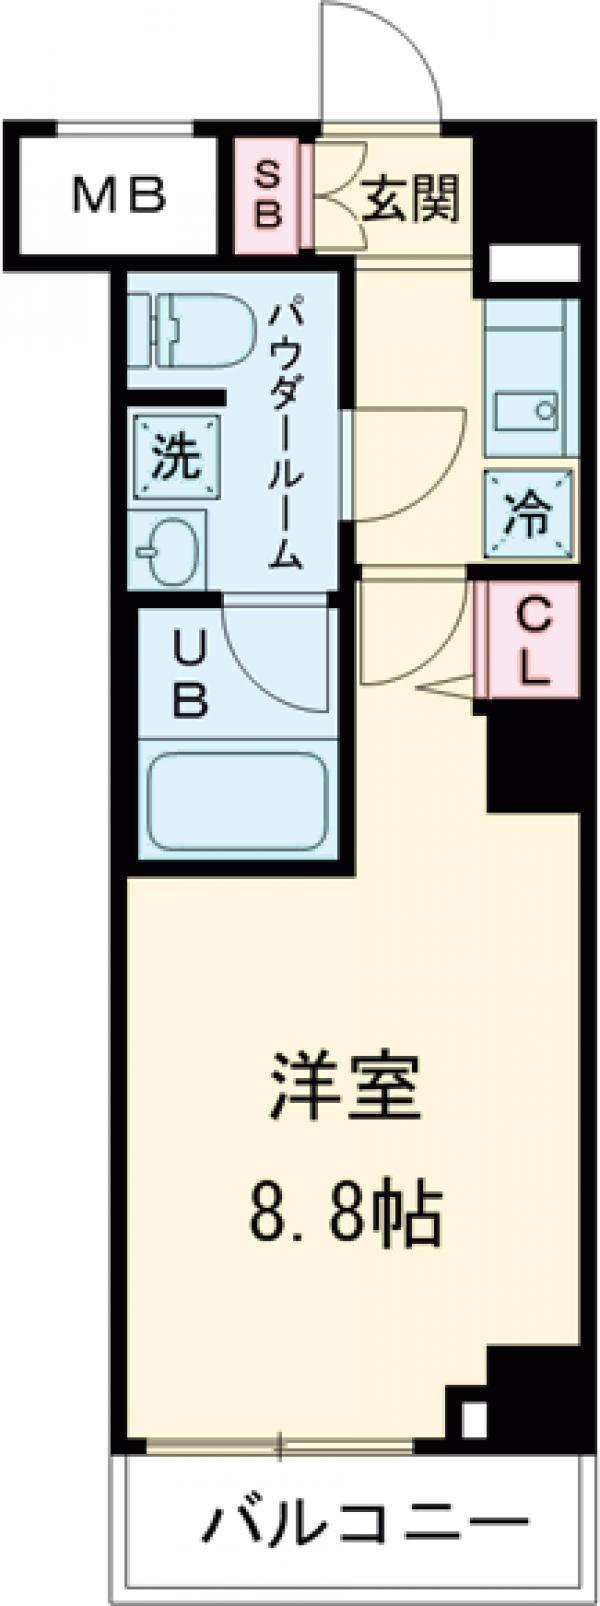 GENOVIA西高島平skygarden・307号室の間取り